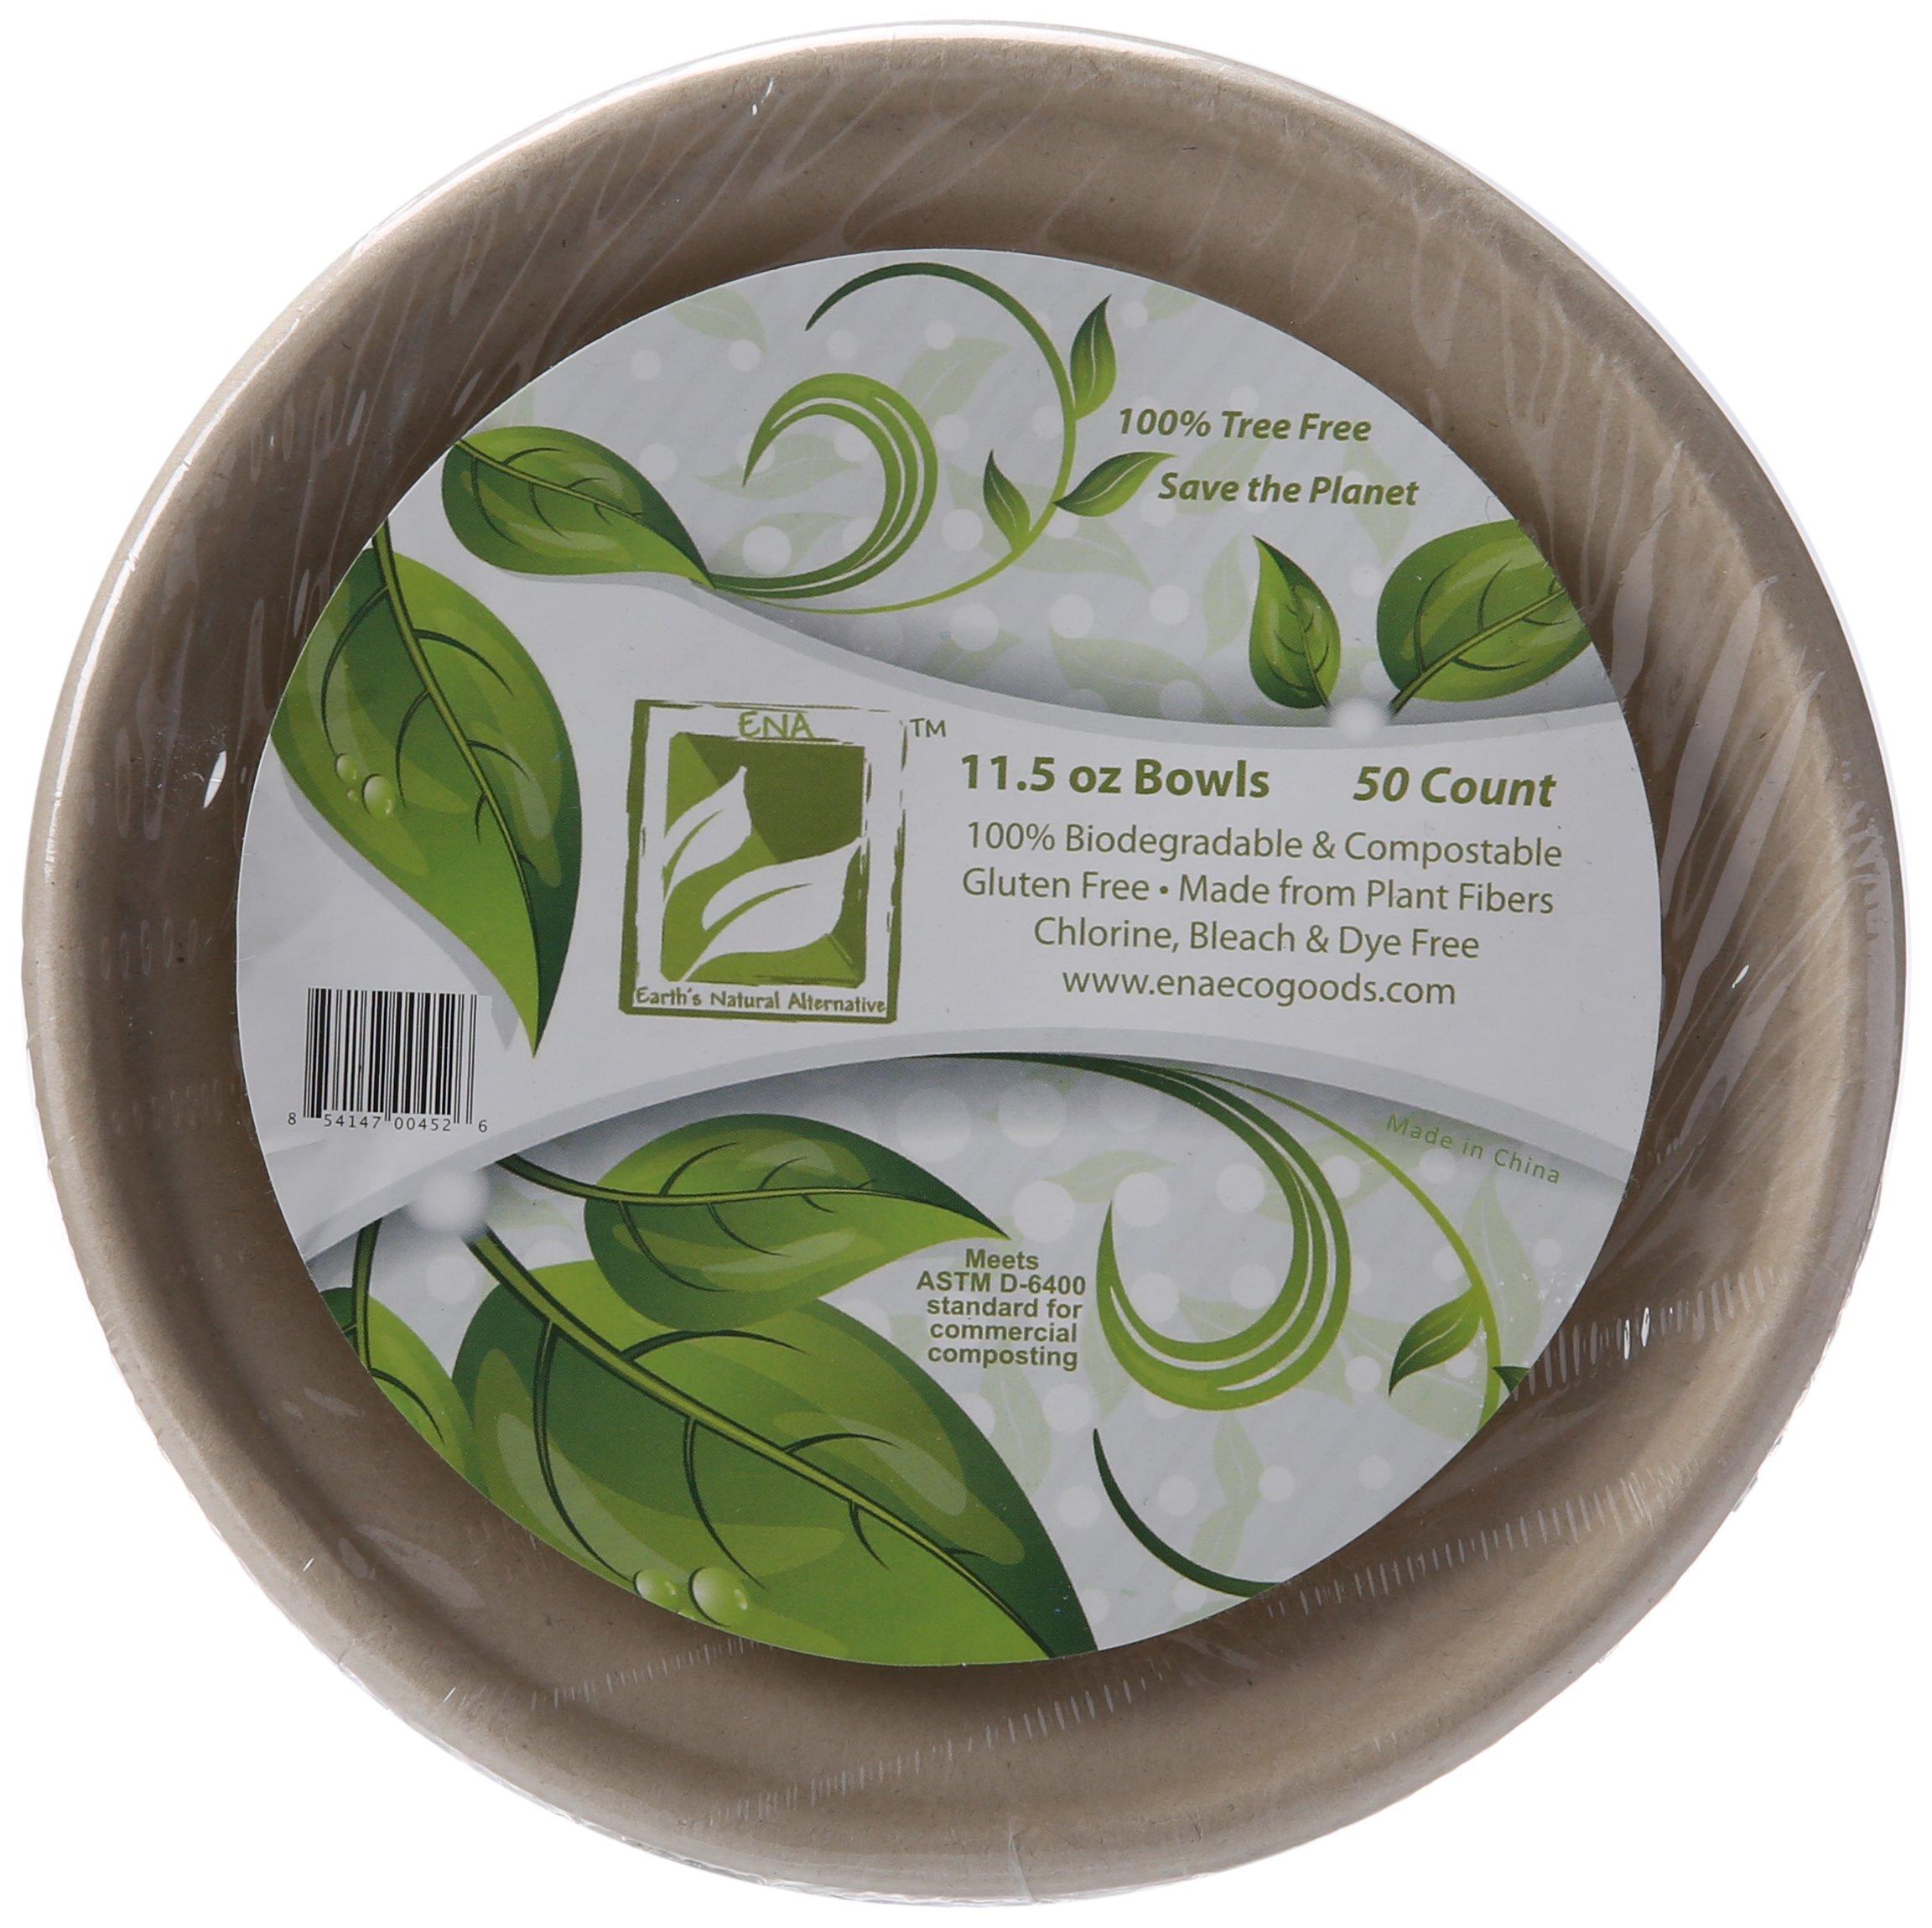 Earth's Natural Alternative Wheat Straw Fiber, Bagasse (Sugarcane) Tree Free 11.5oz Bowl, 50-Pack